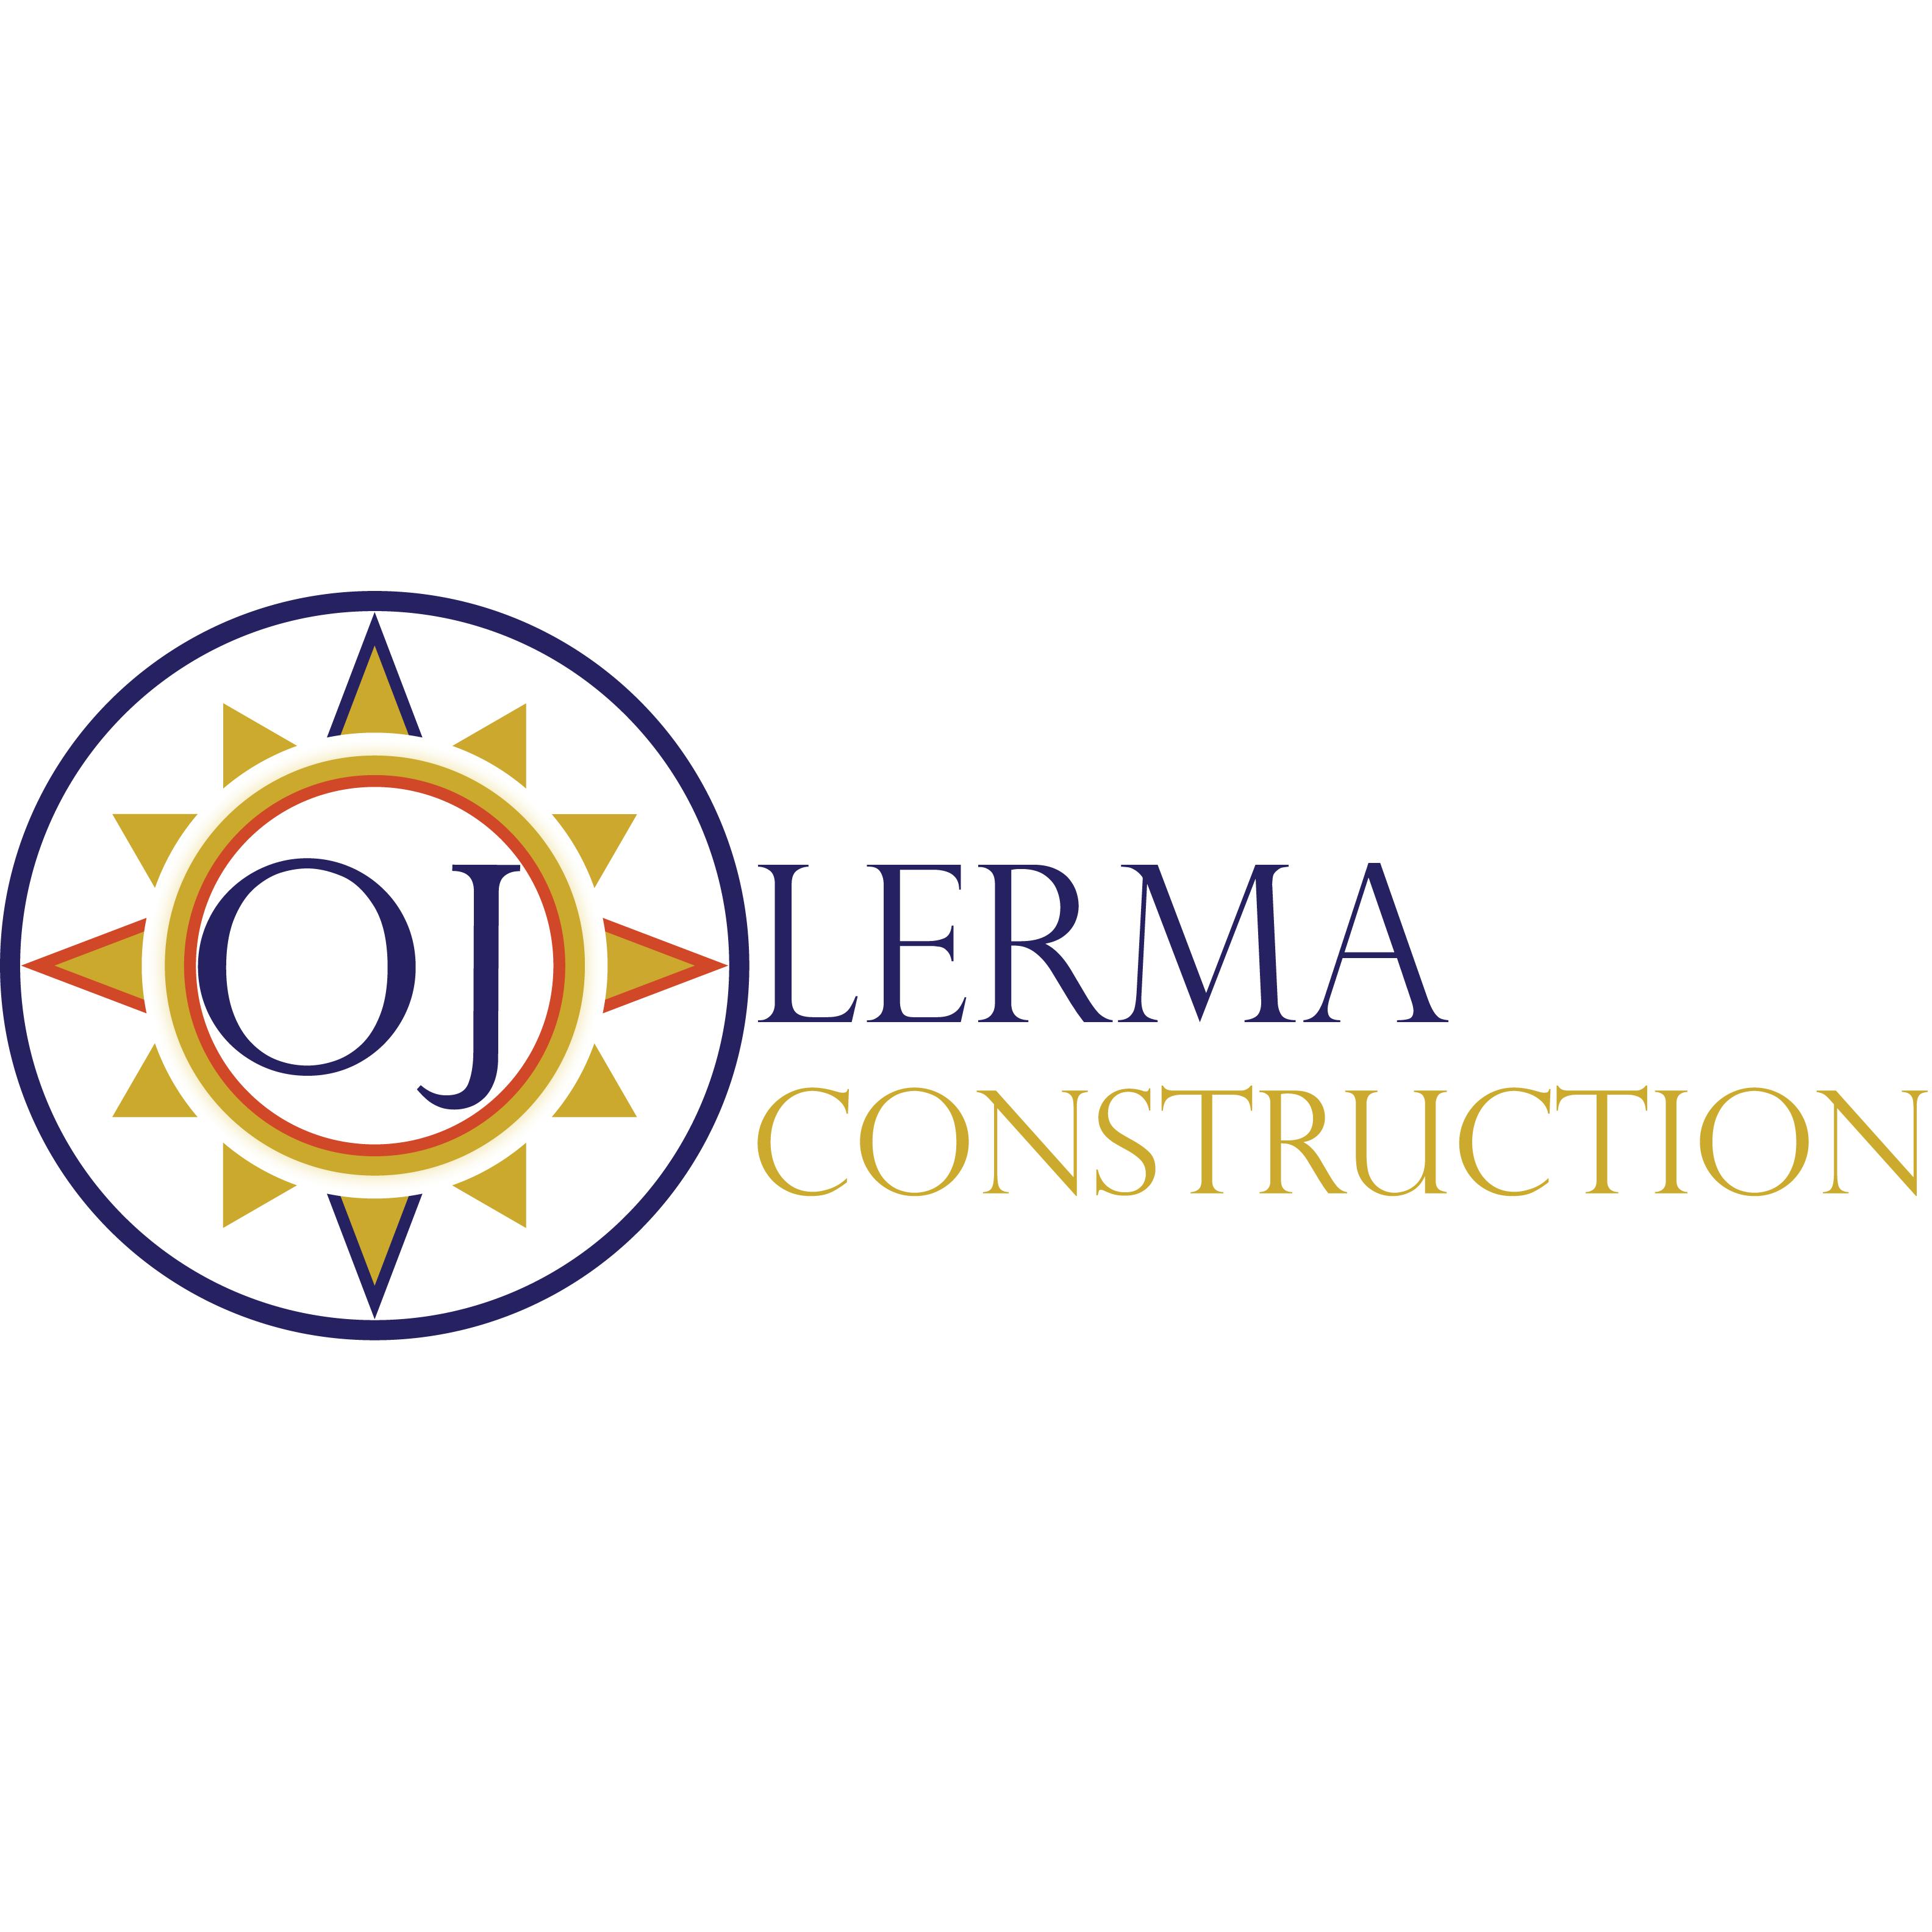 OJ Lerma Construction